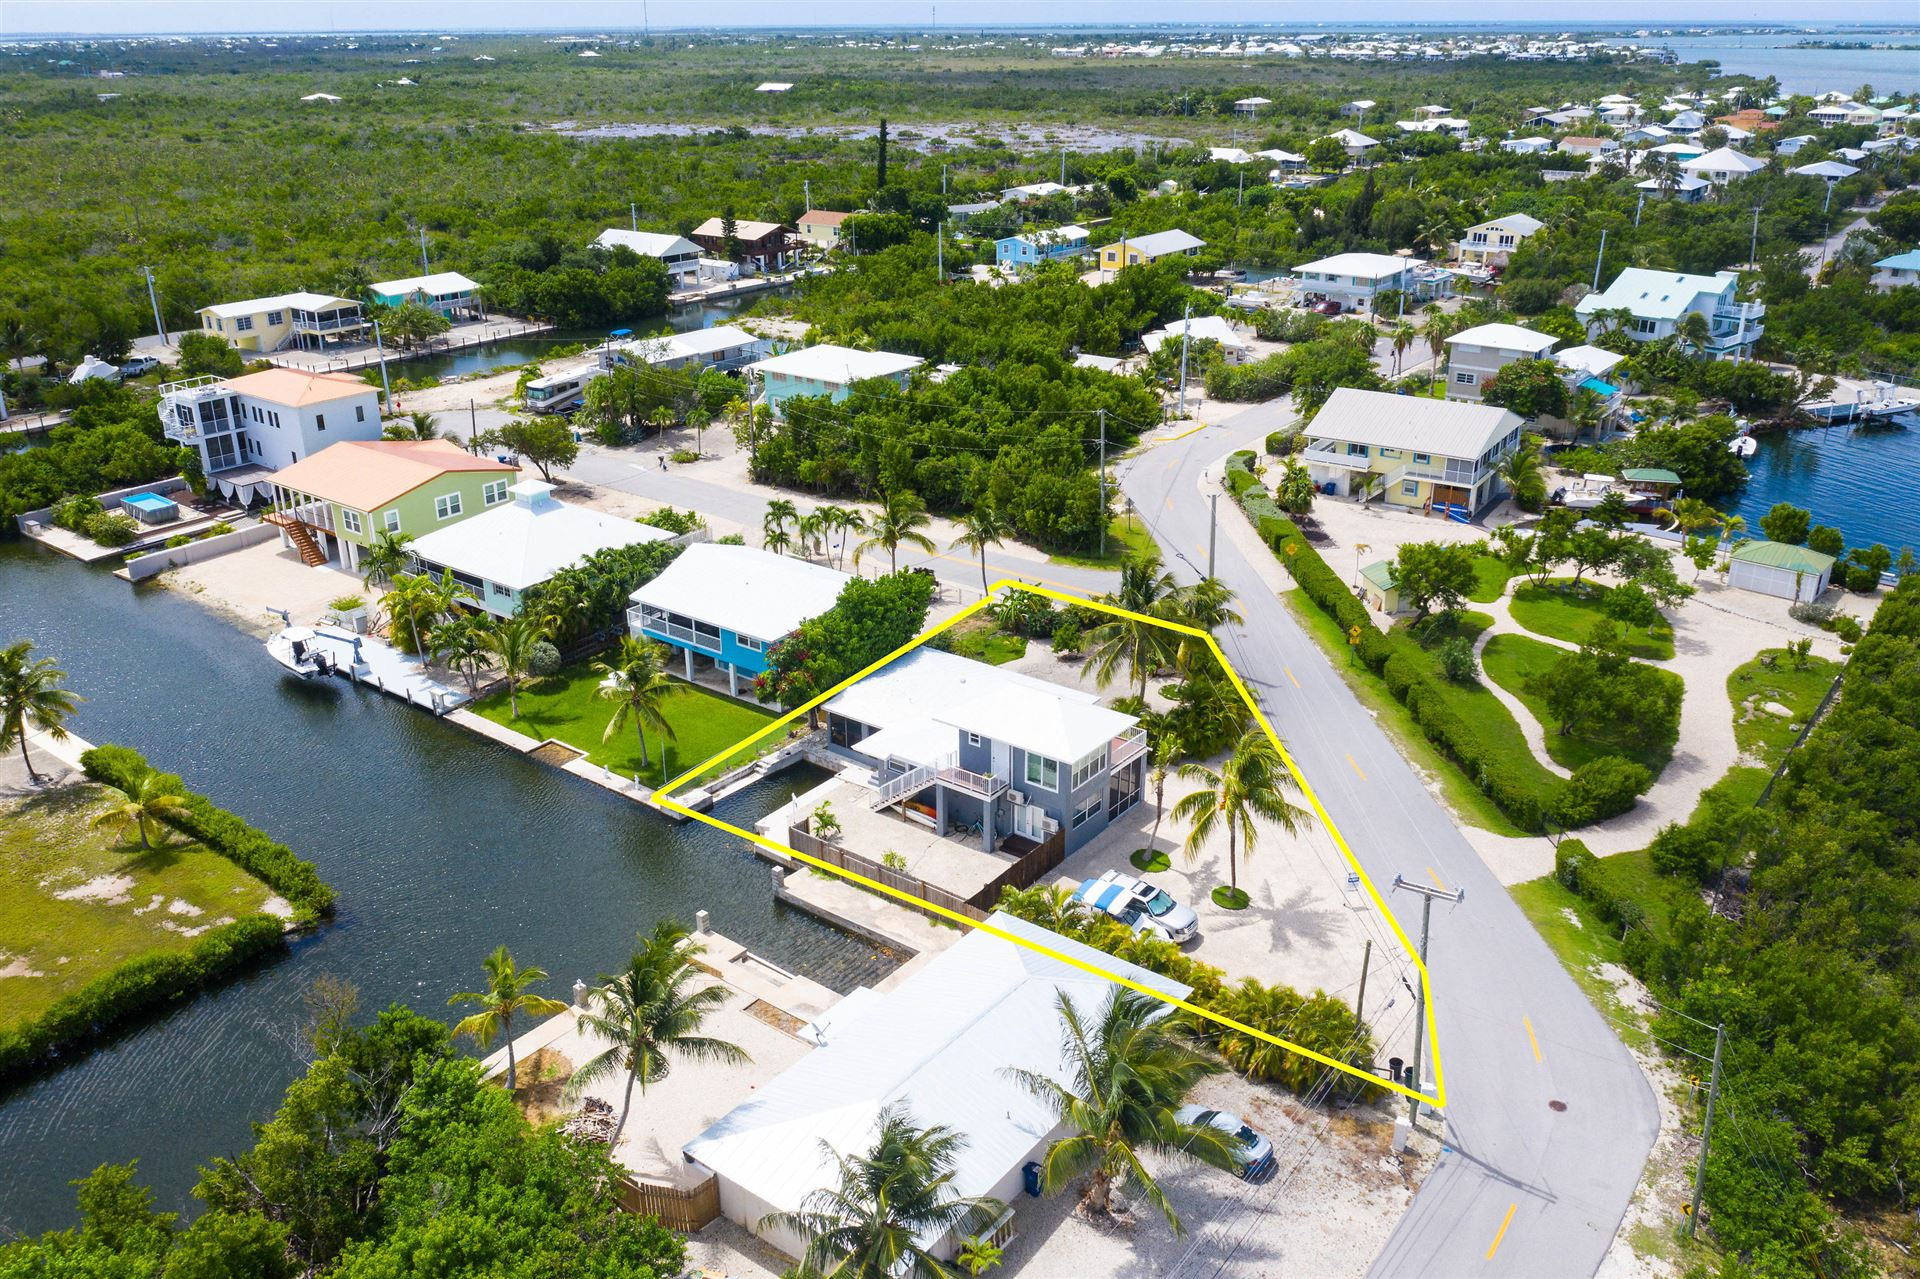 1287 W Shore Drive, Big Pine, FL 33043 - #: 591684